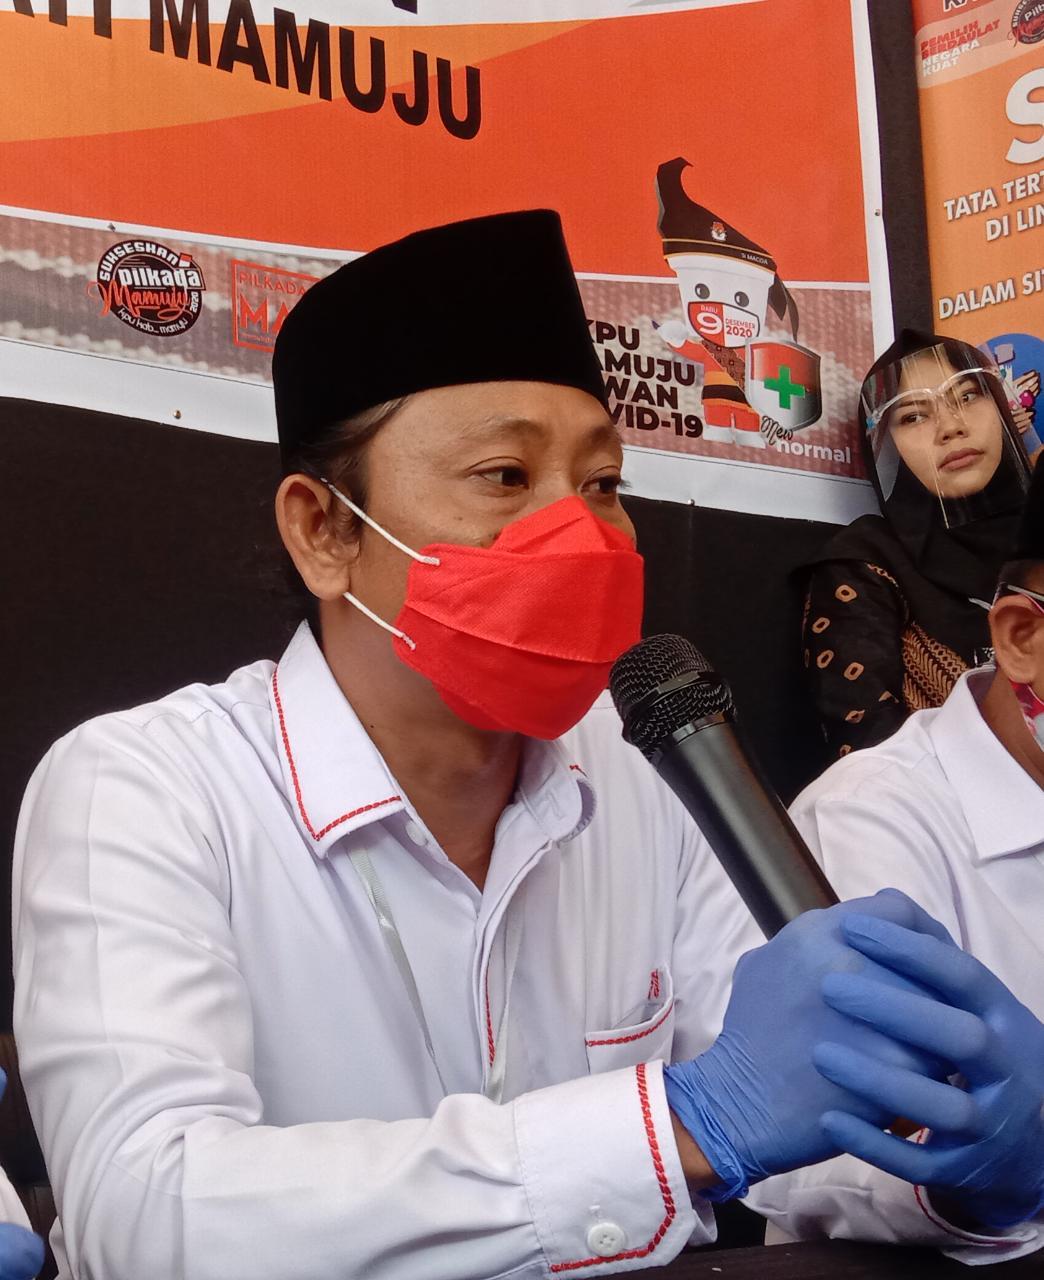 Maju Pilkada,Surat Pengunduran Diri Ado Mas'ud Dari DPRD Sementara Proses